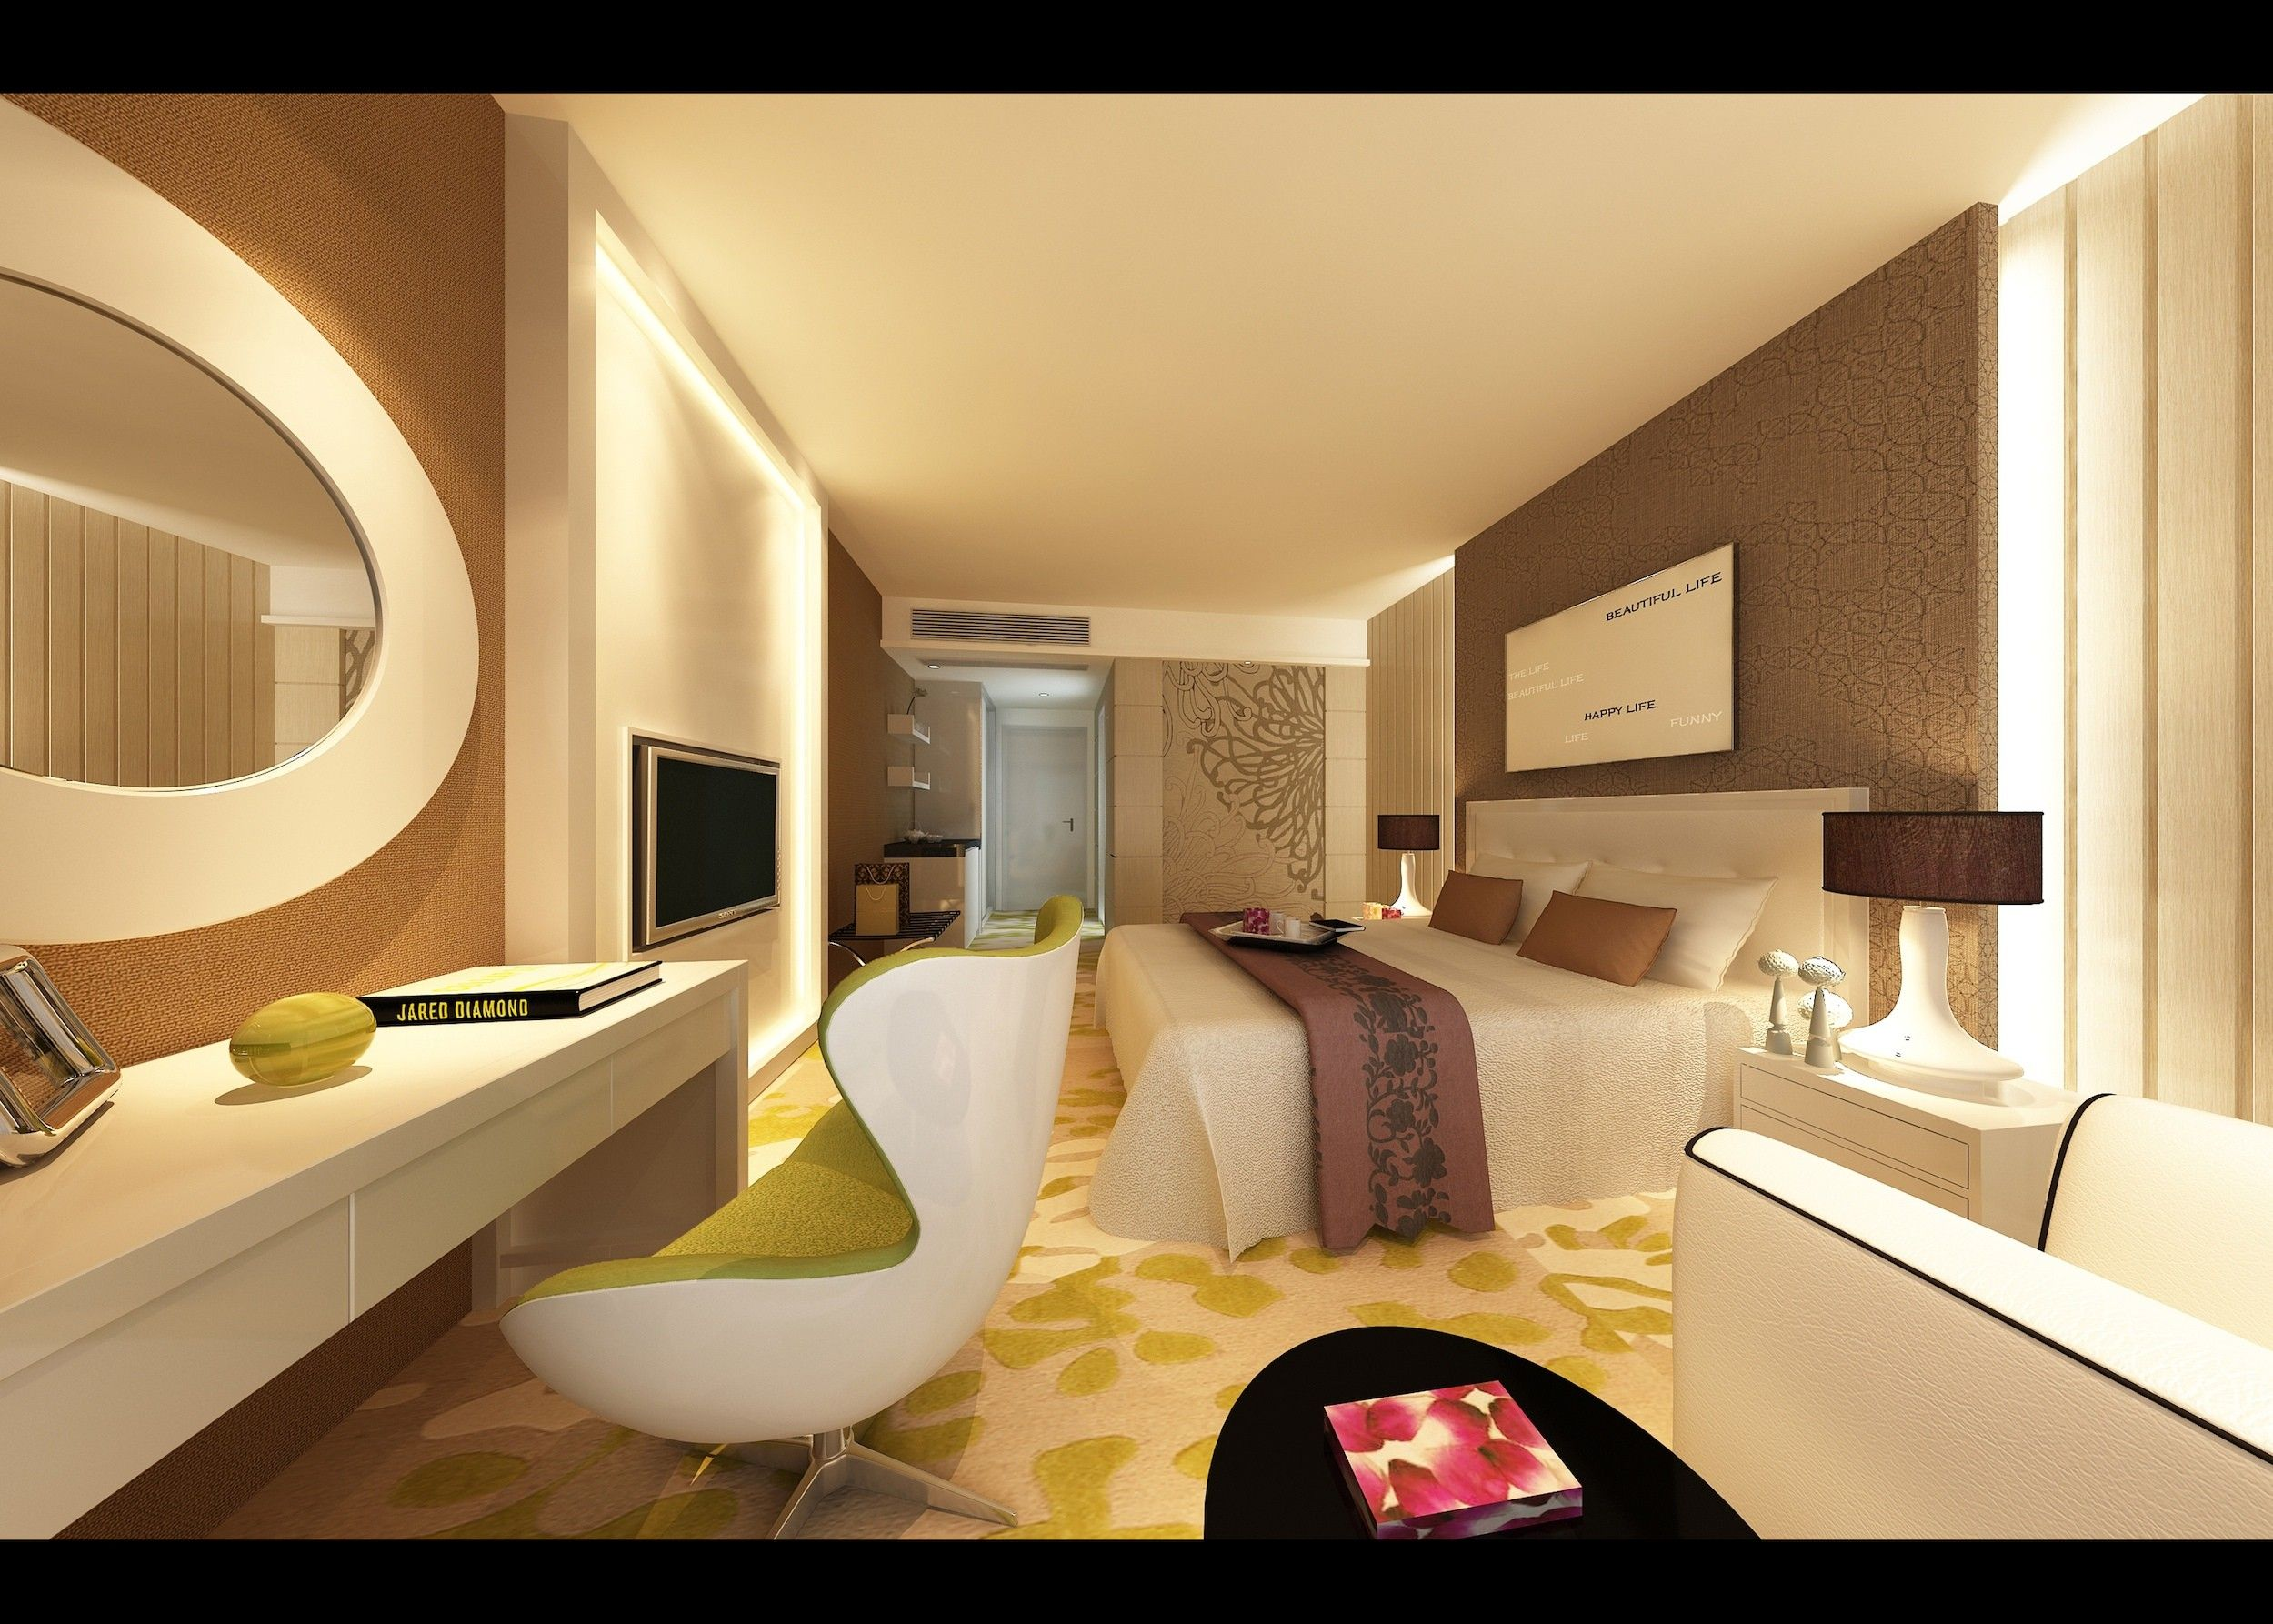 Hotel luggage rack google search hotel furniture for Design hotel elephant